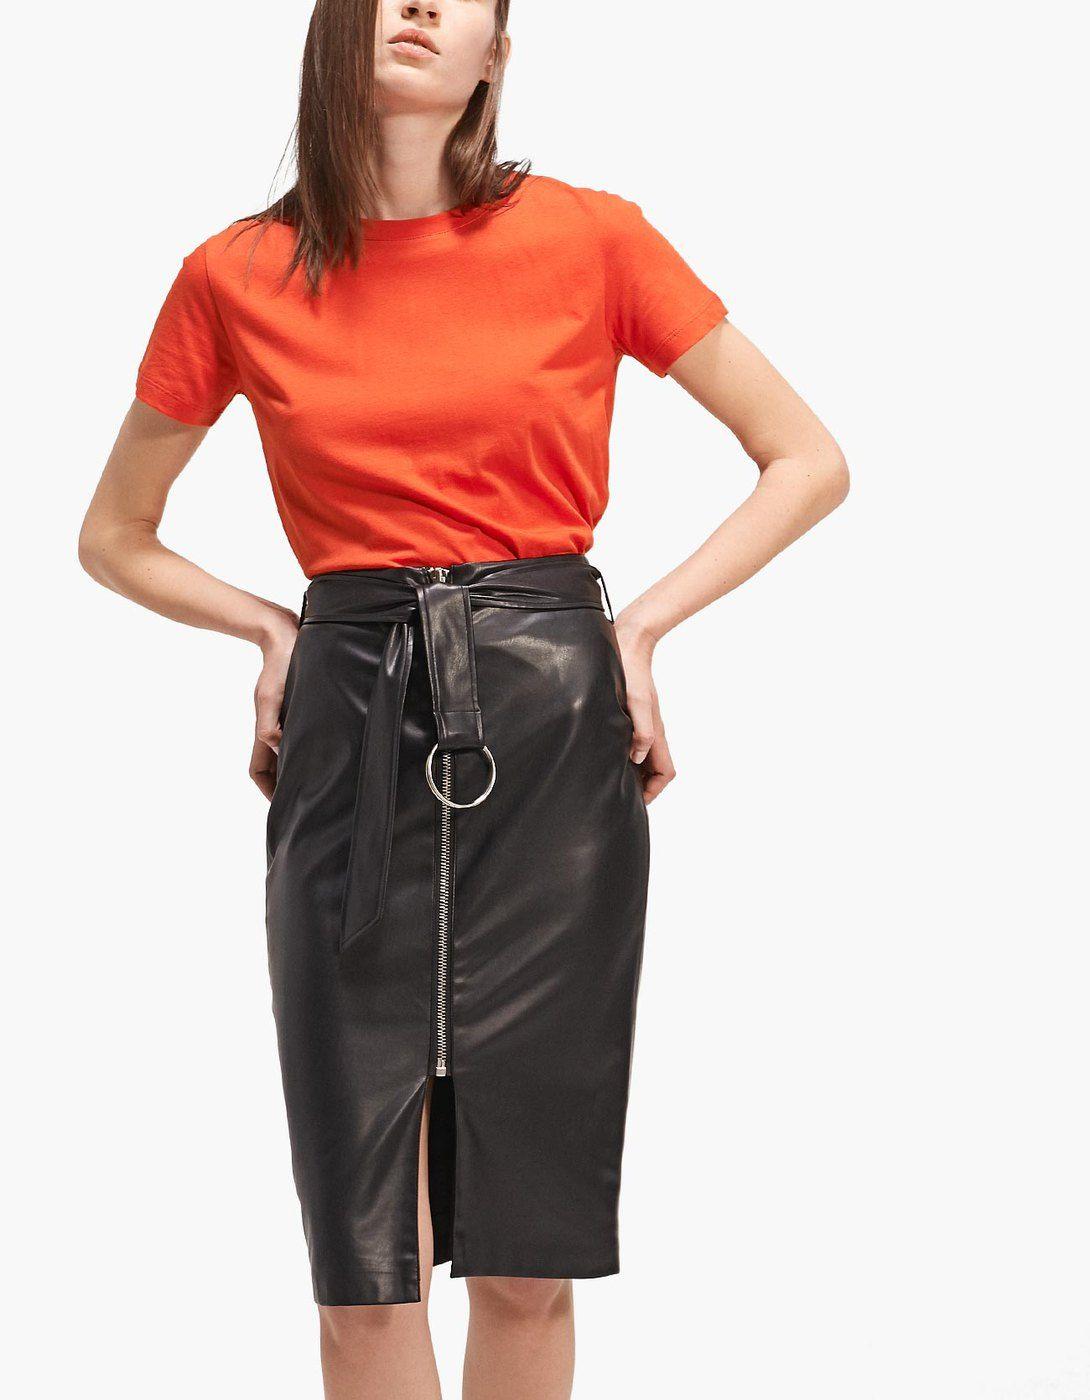 Falda tubo zipper efecto piel Faldas | Stradivarius España